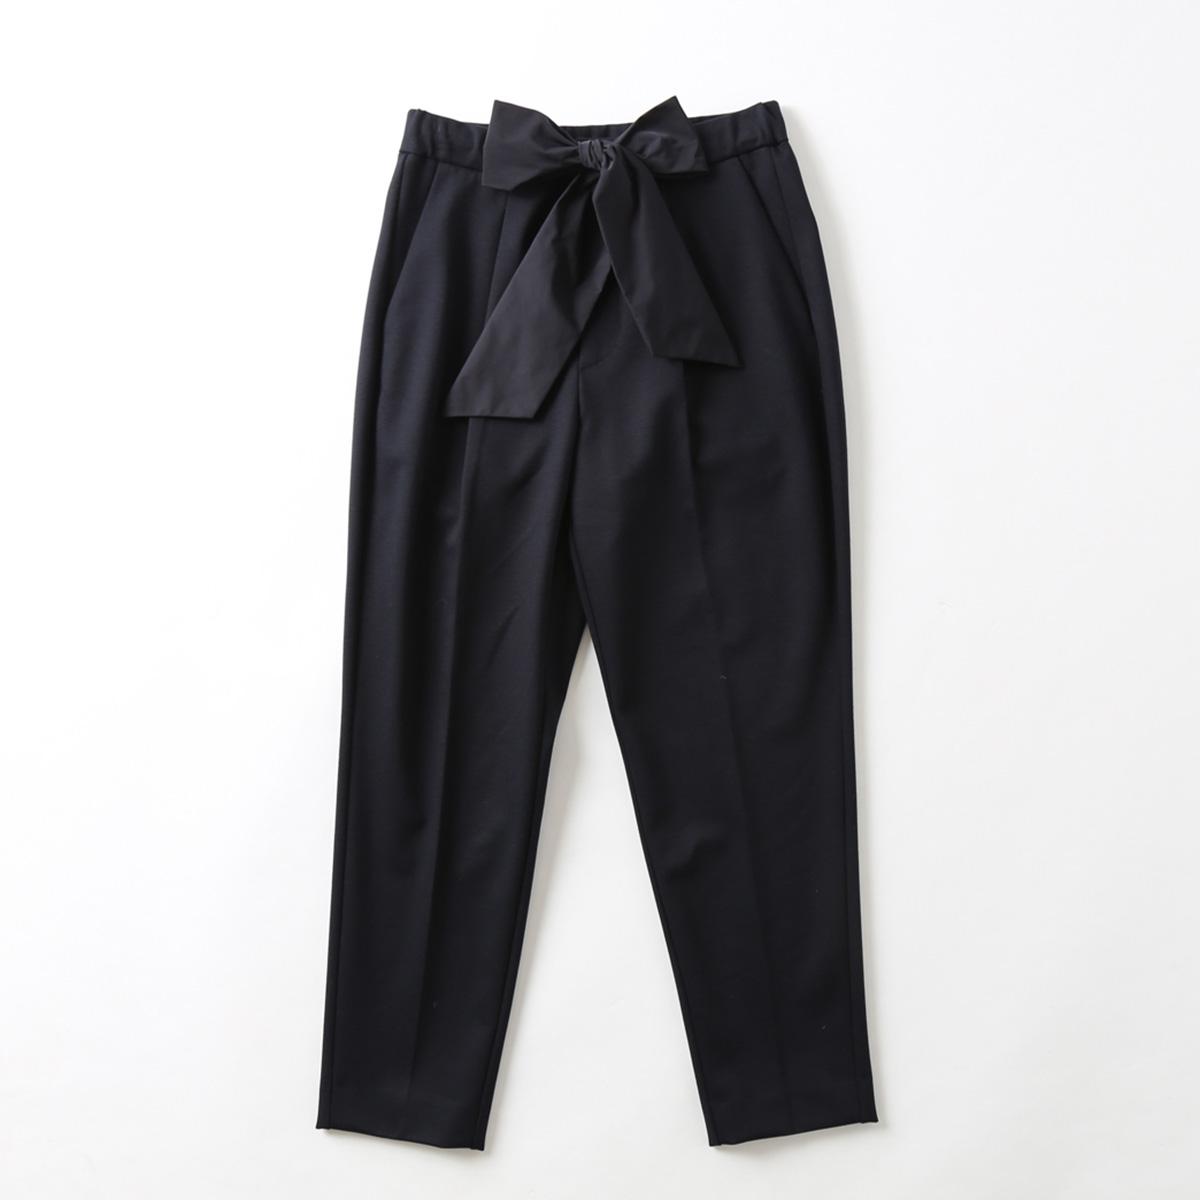 『Dress knit』Tapered Pants NAVY画像